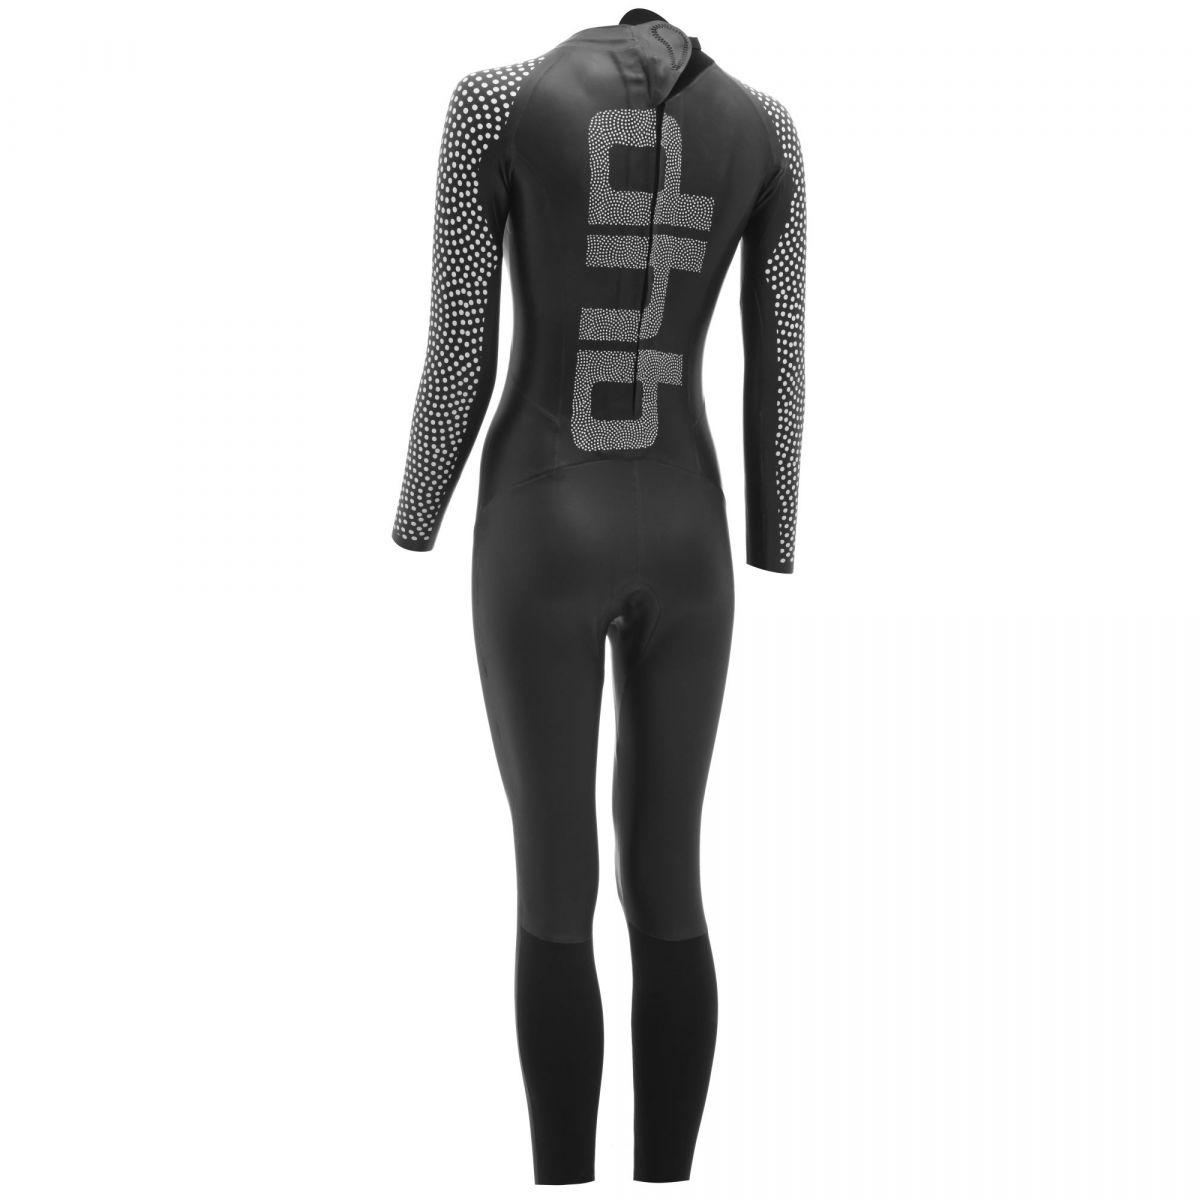 dhb-Moda-Wetsuit-women-back